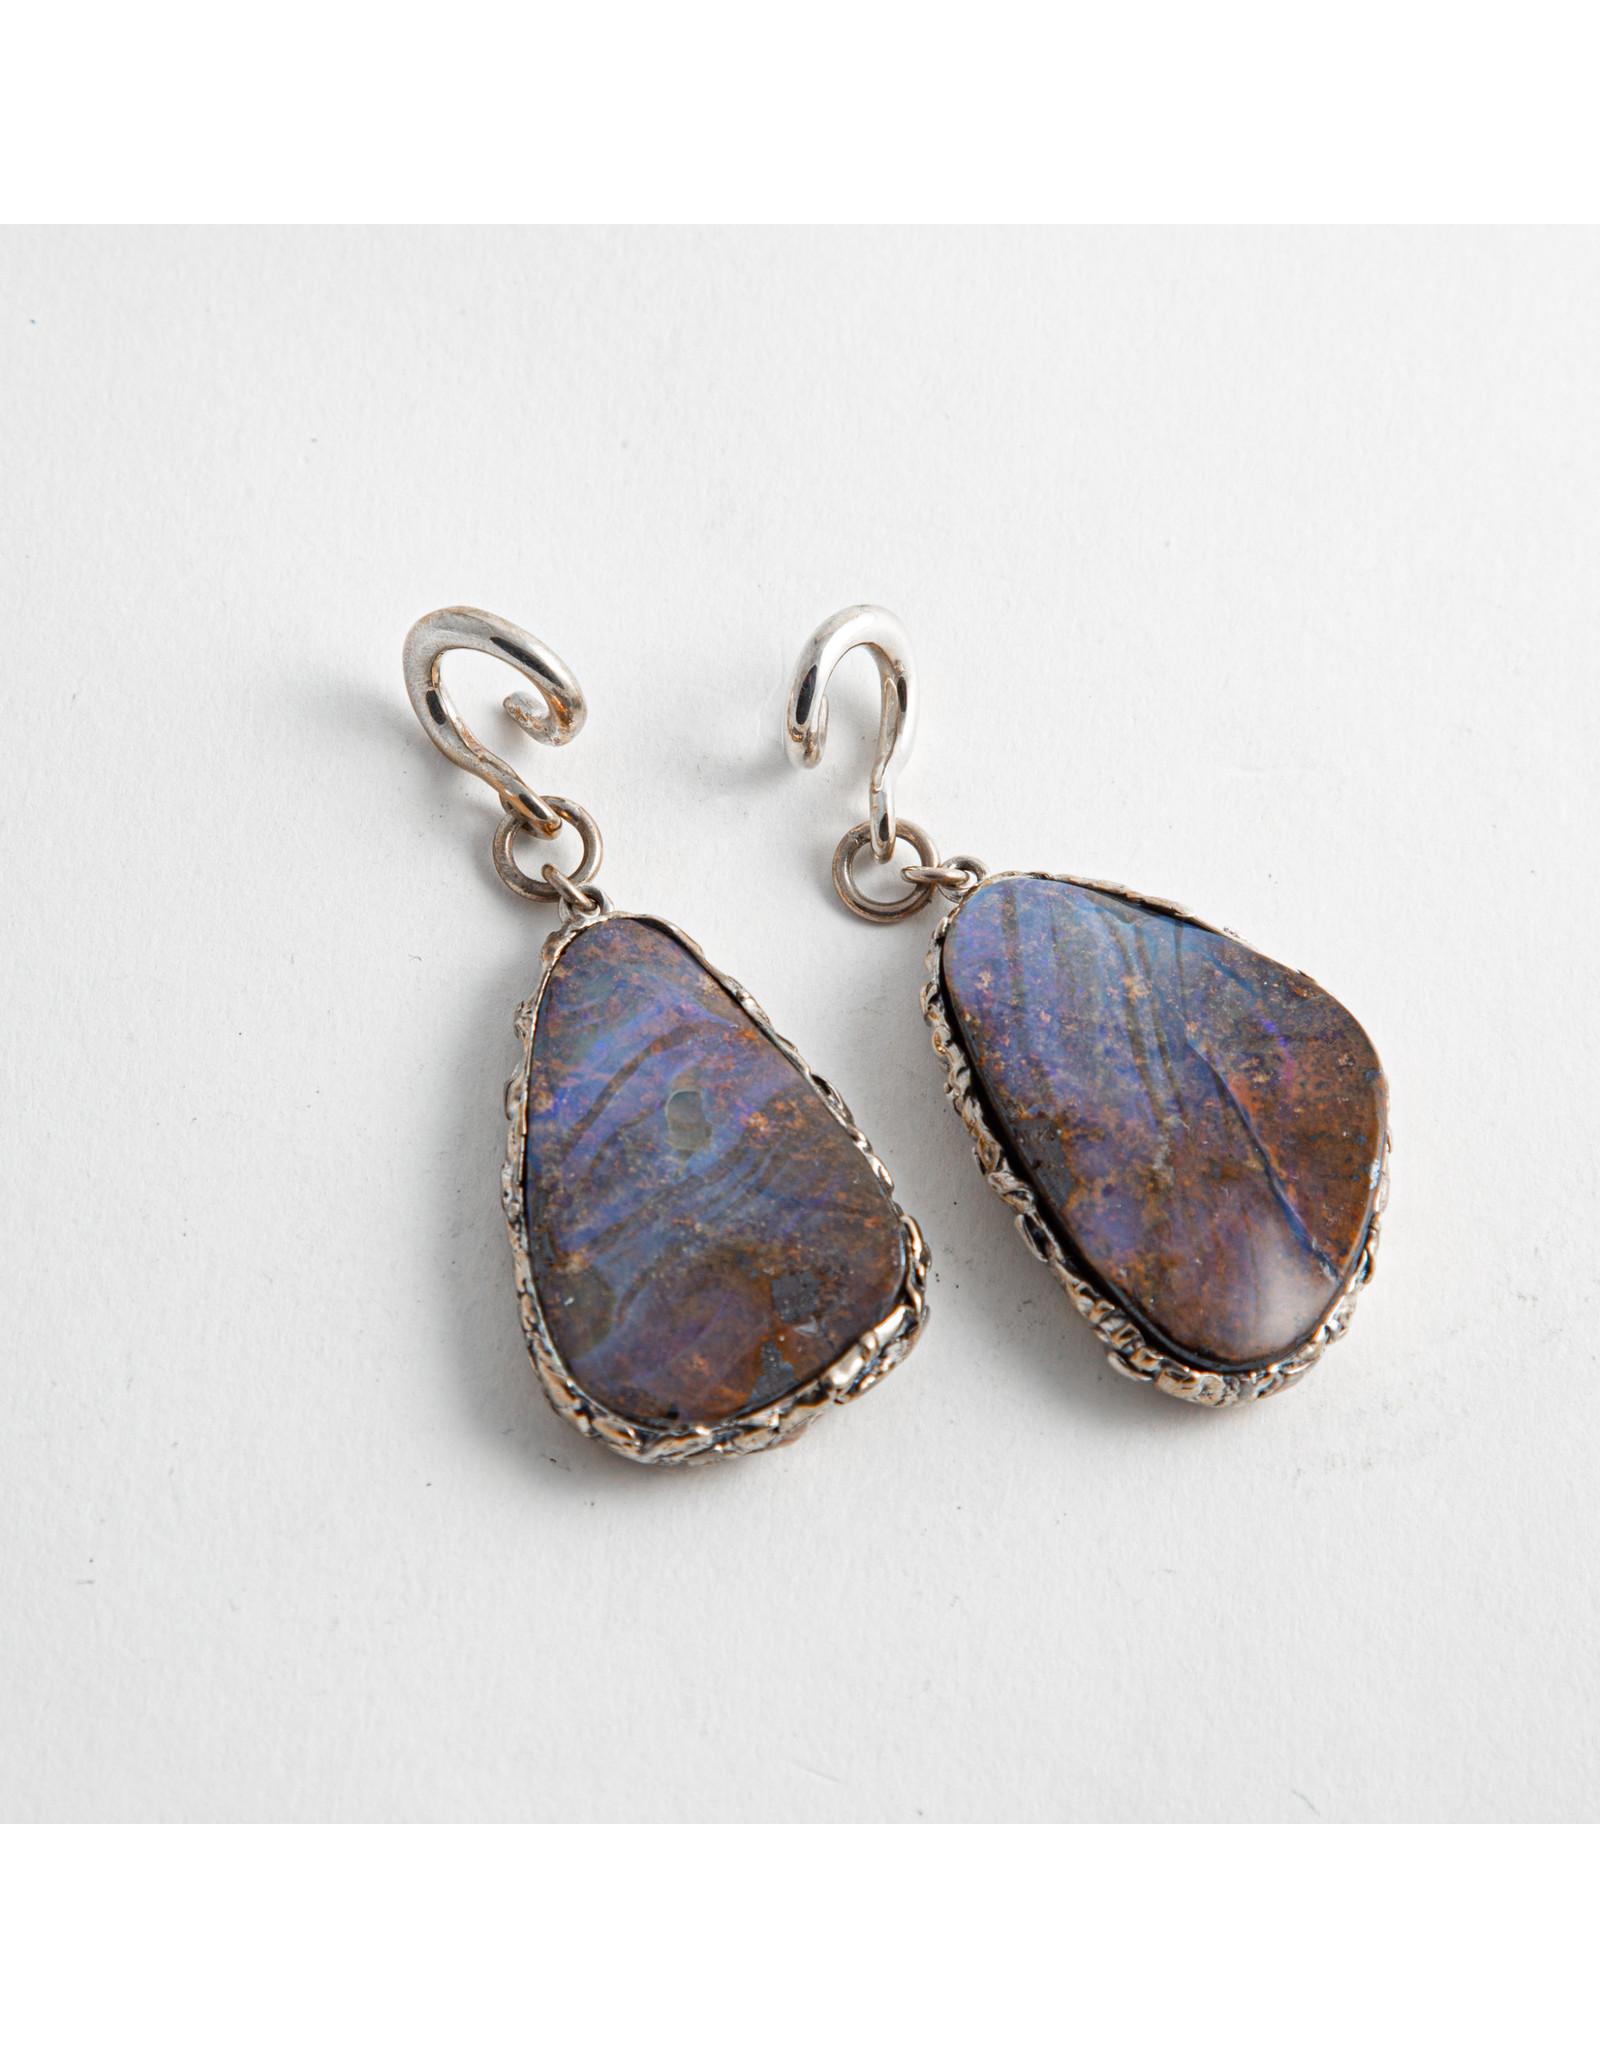 Diablo Organics Diablo Organics silver set boulder opal on small, silver, classic coil